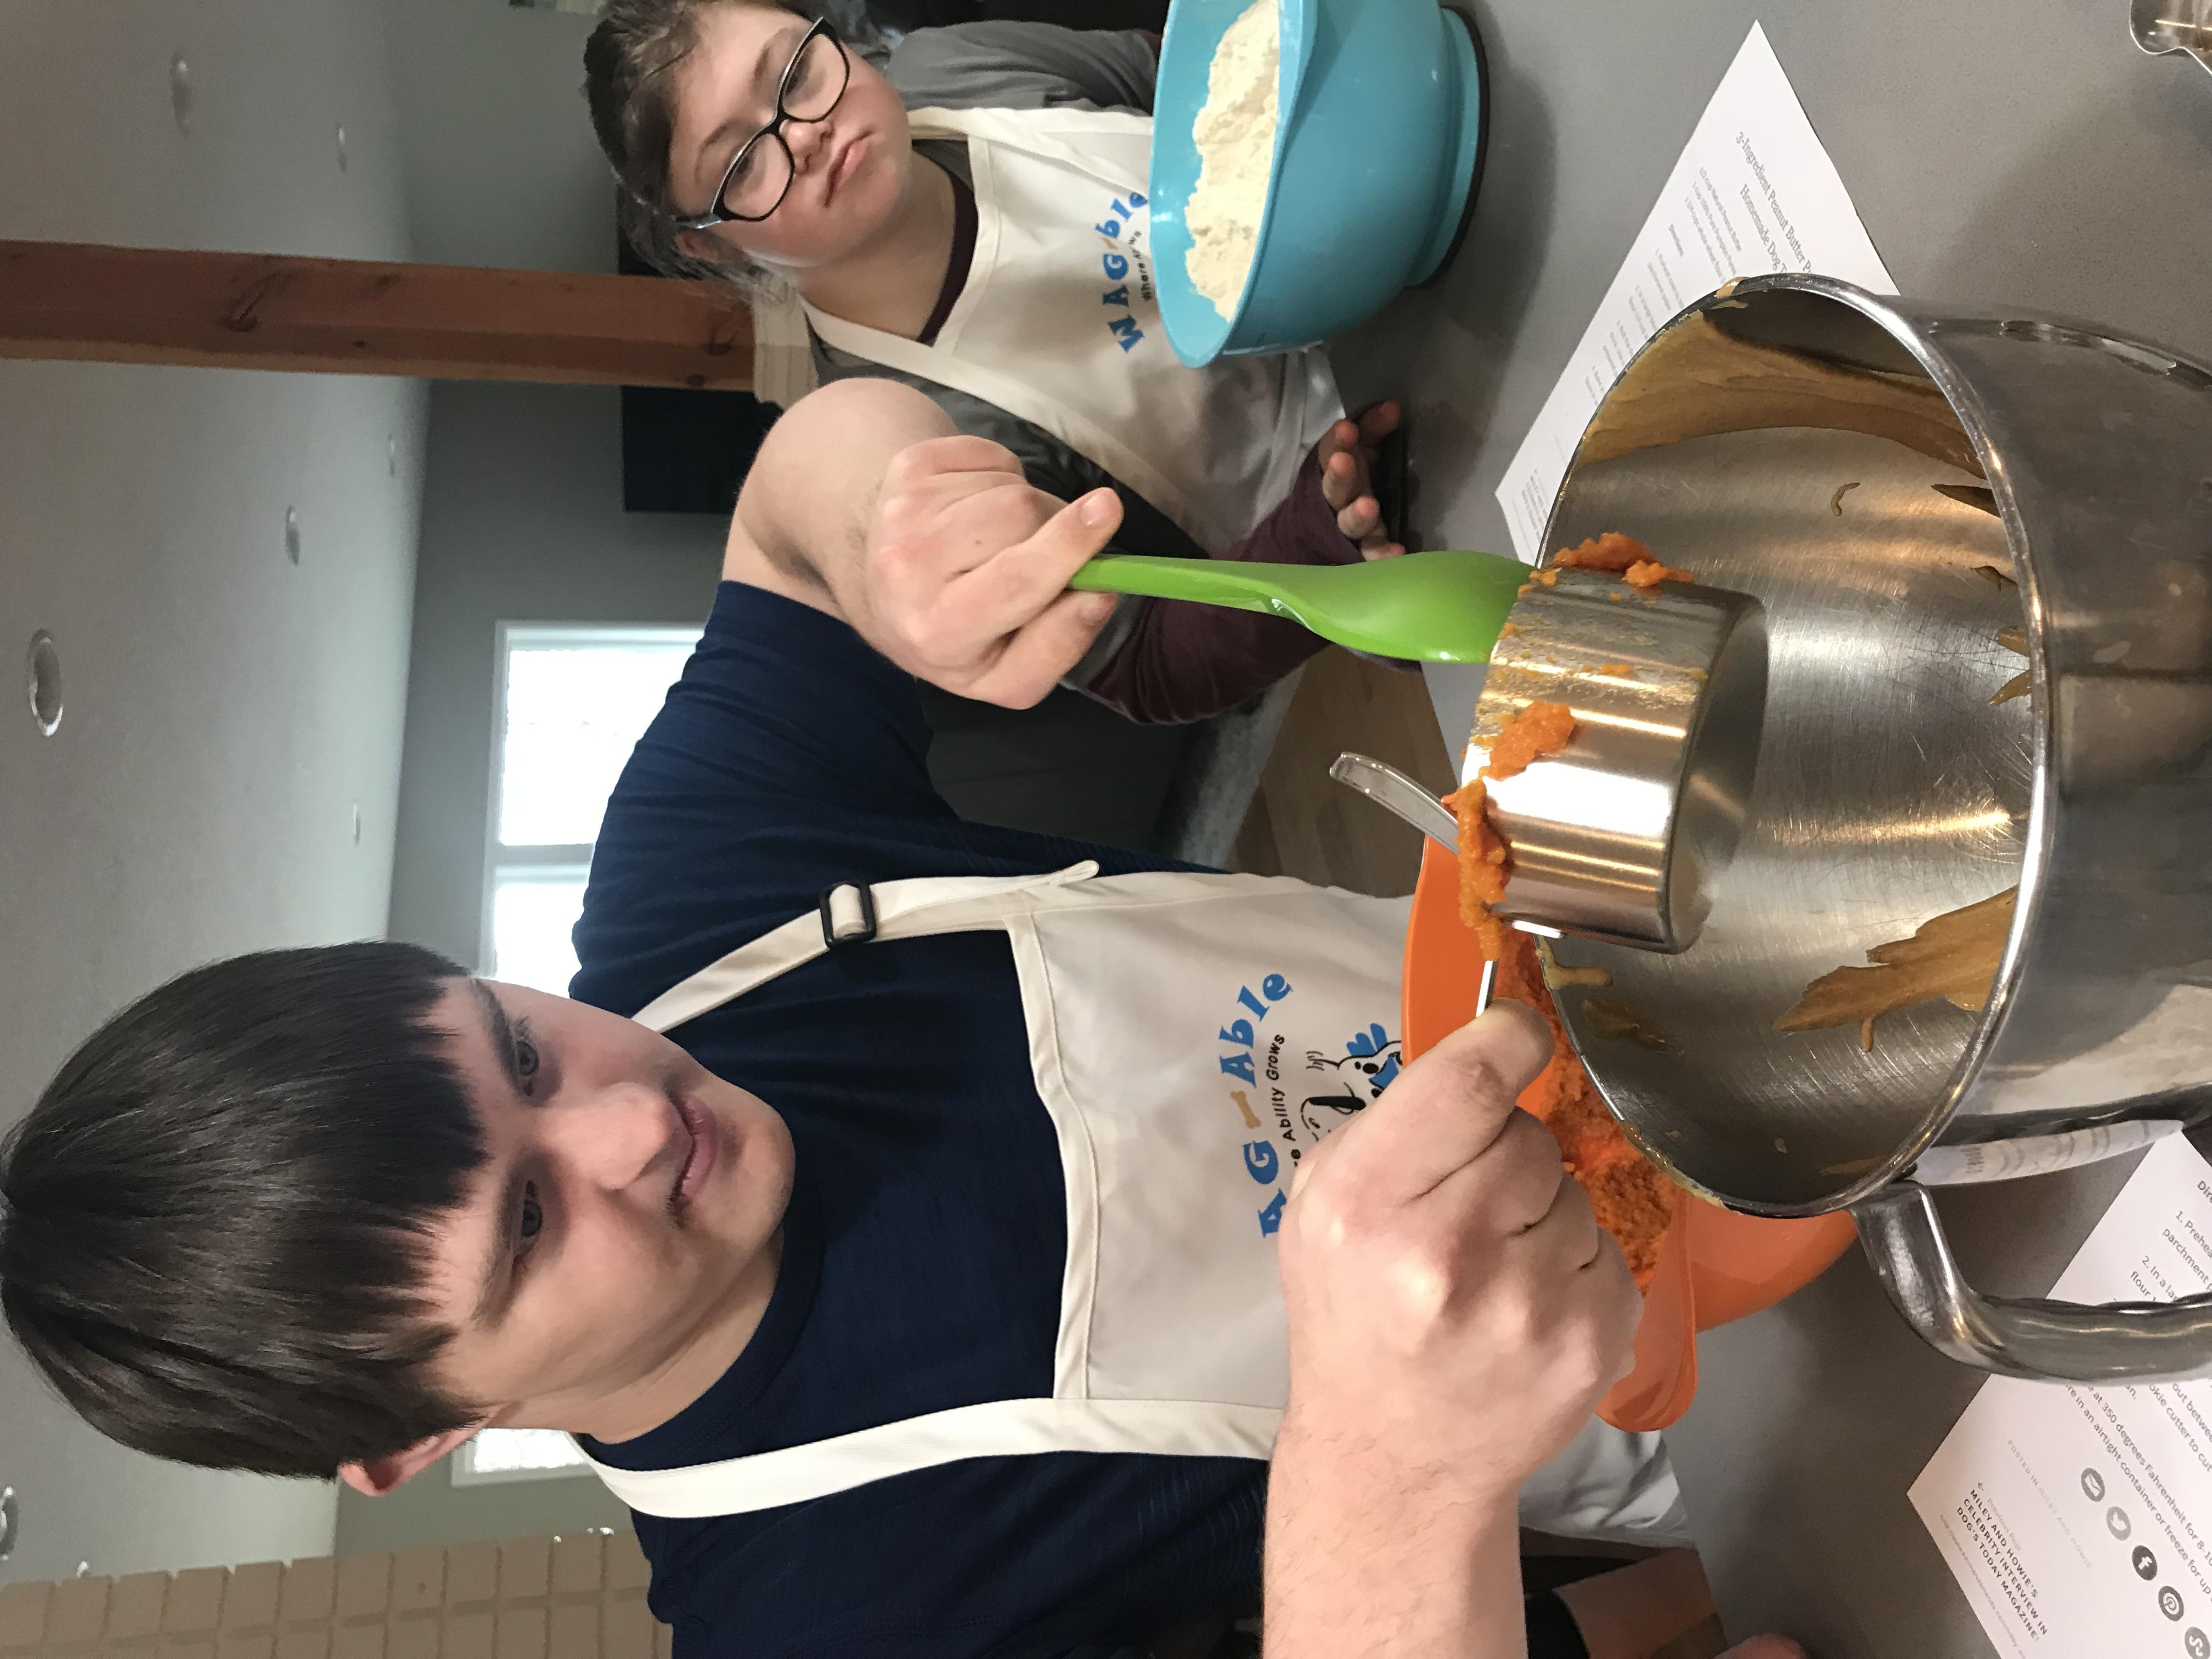 Daniel adding pumpkin